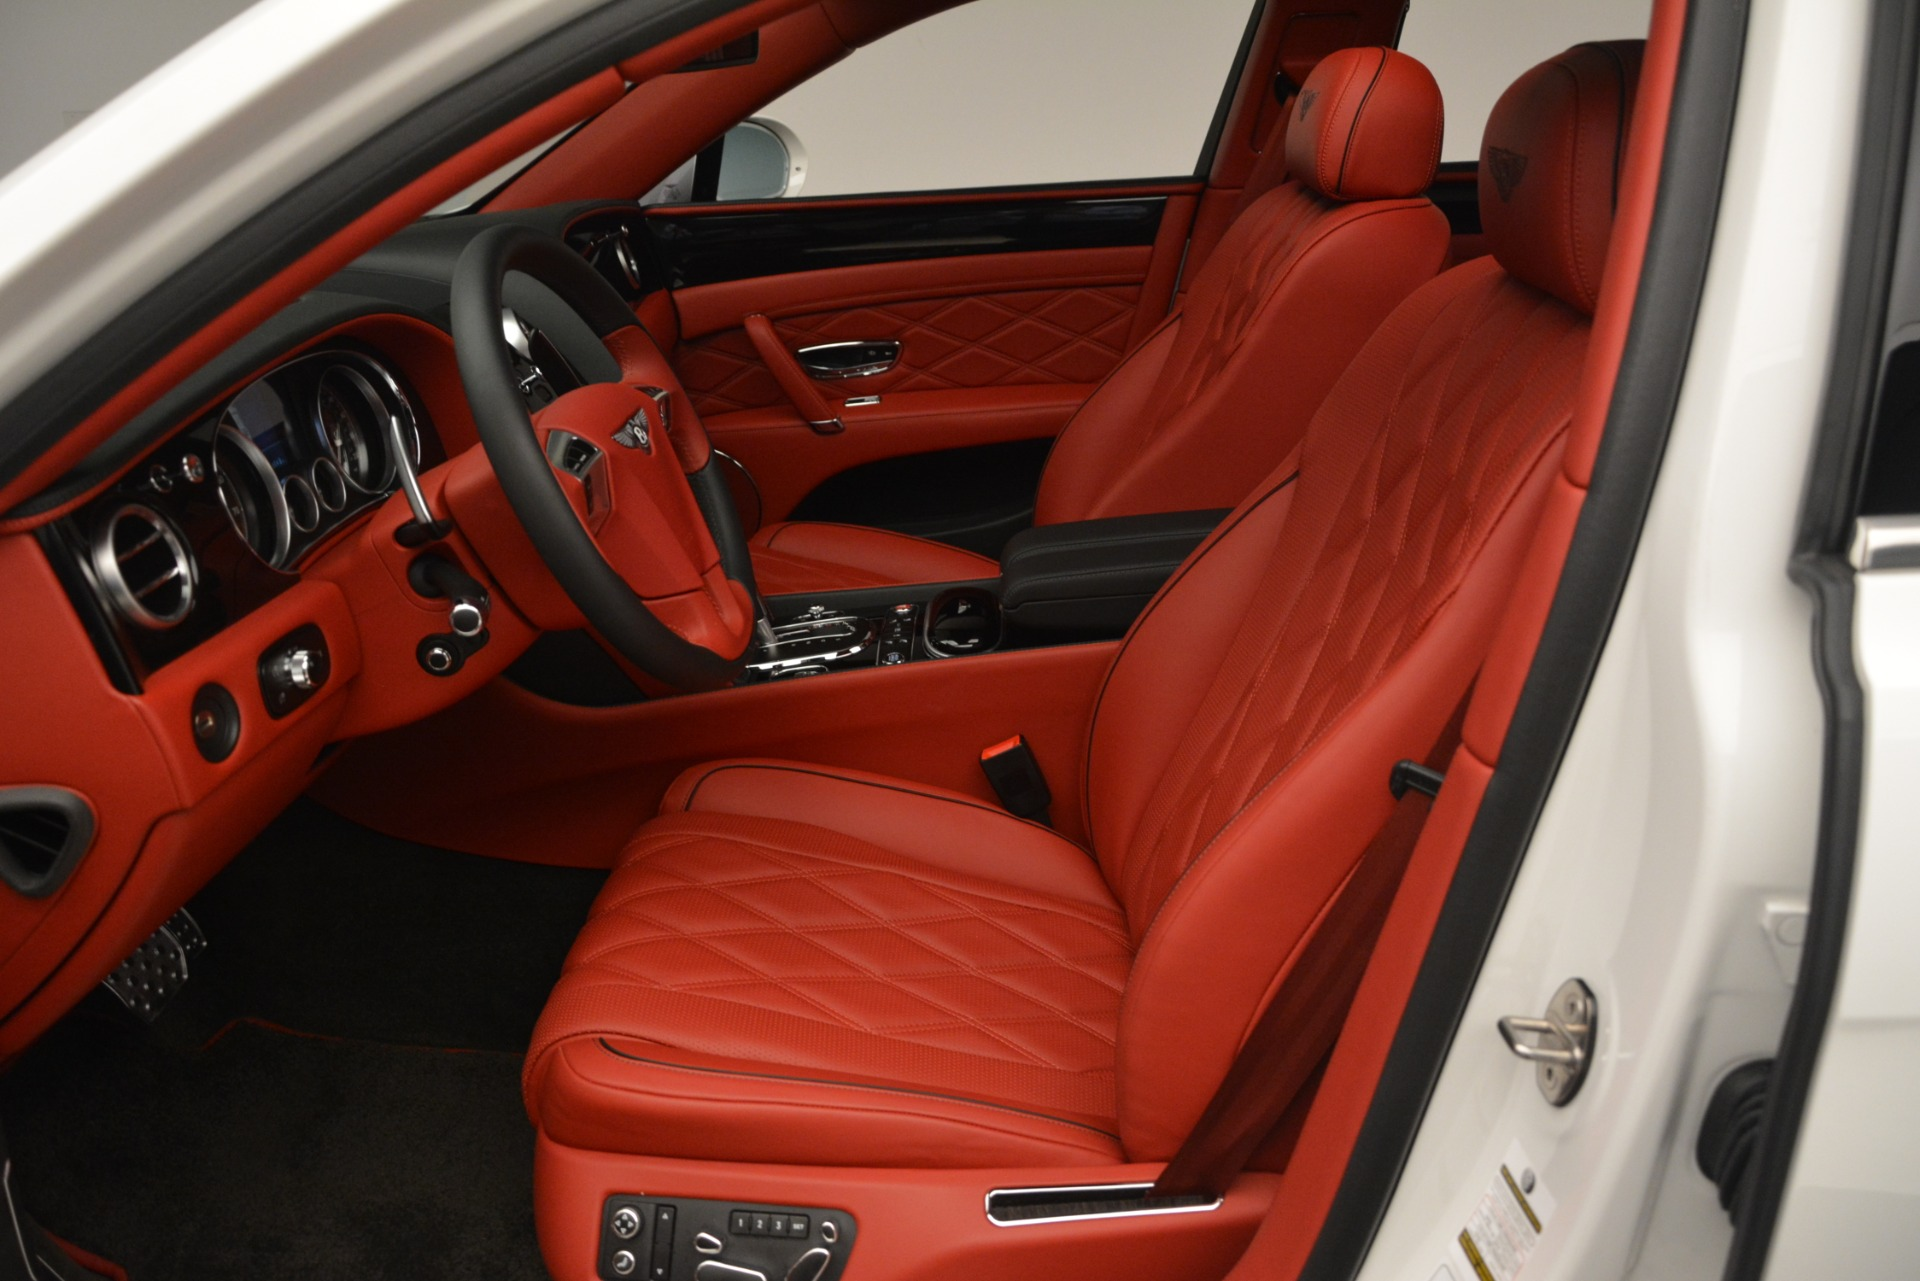 Used 2016 Bentley Flying Spur V8 For Sale In Westport, CT 3265_p19